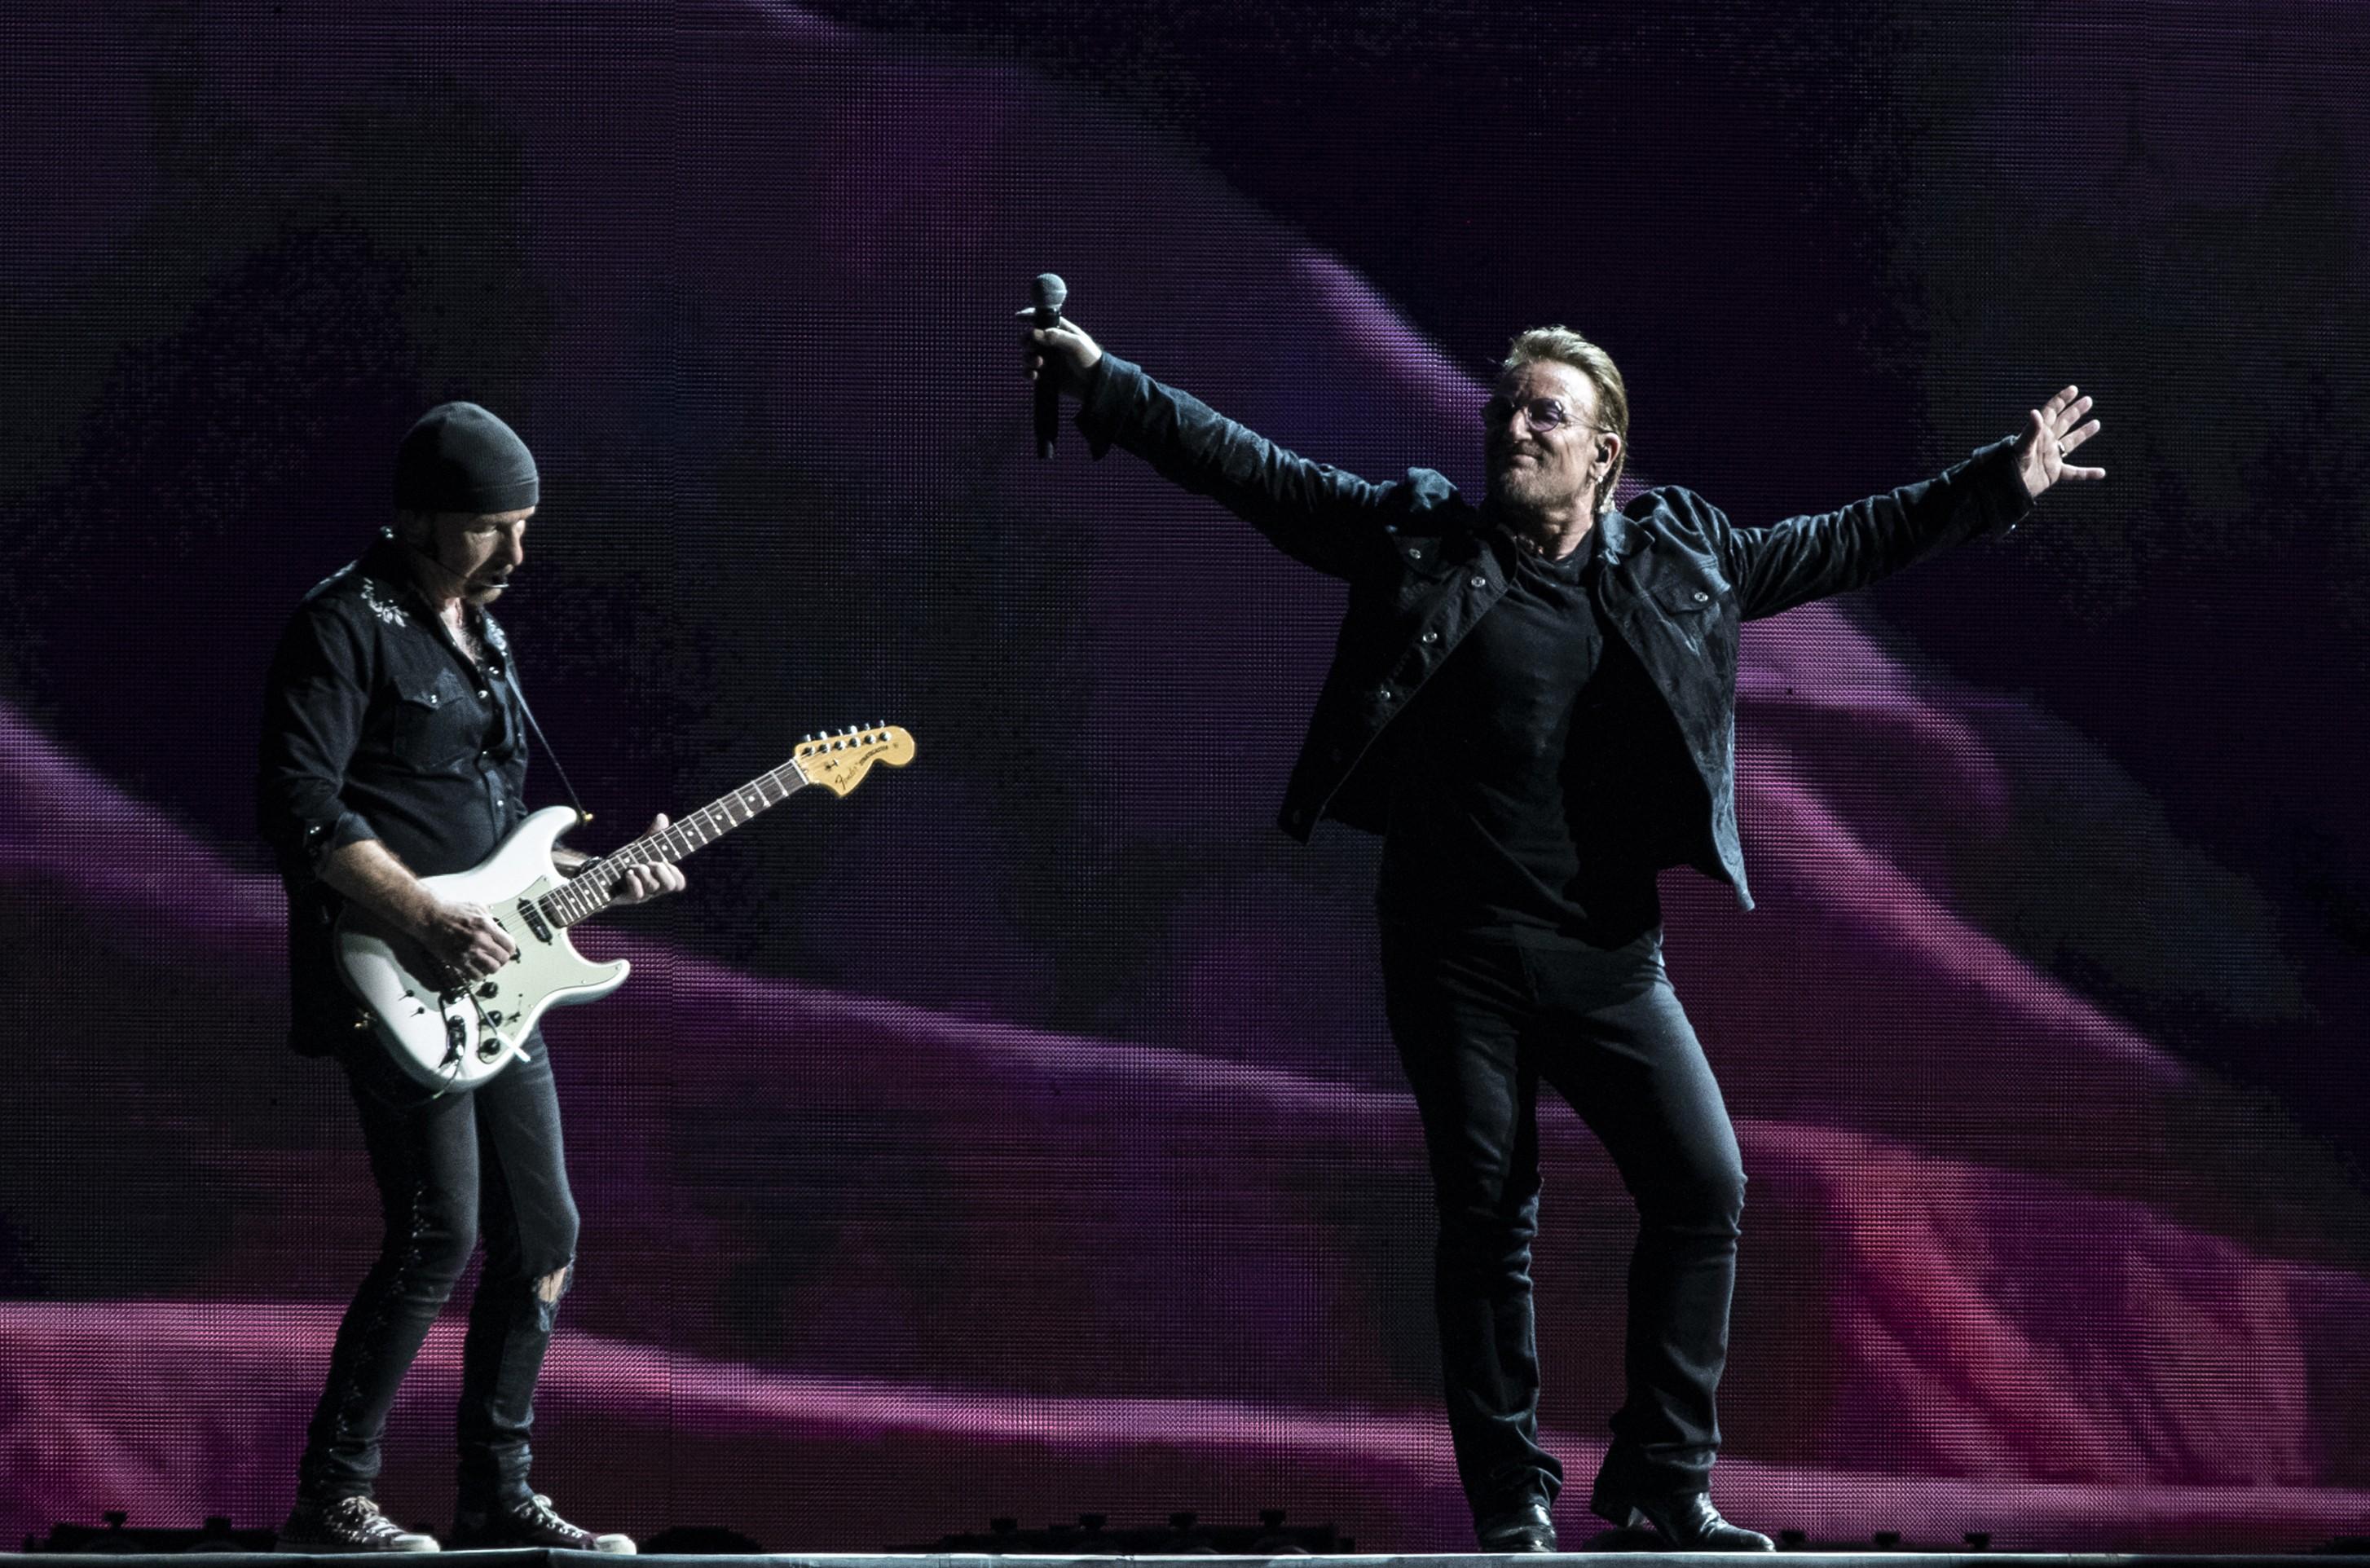 U2 Talk Climate Change Blast The Hits On Joshua Tree Tour Opener In Australia Billboard Gomez joshua most popular professions. joshua tree tour opener in australia